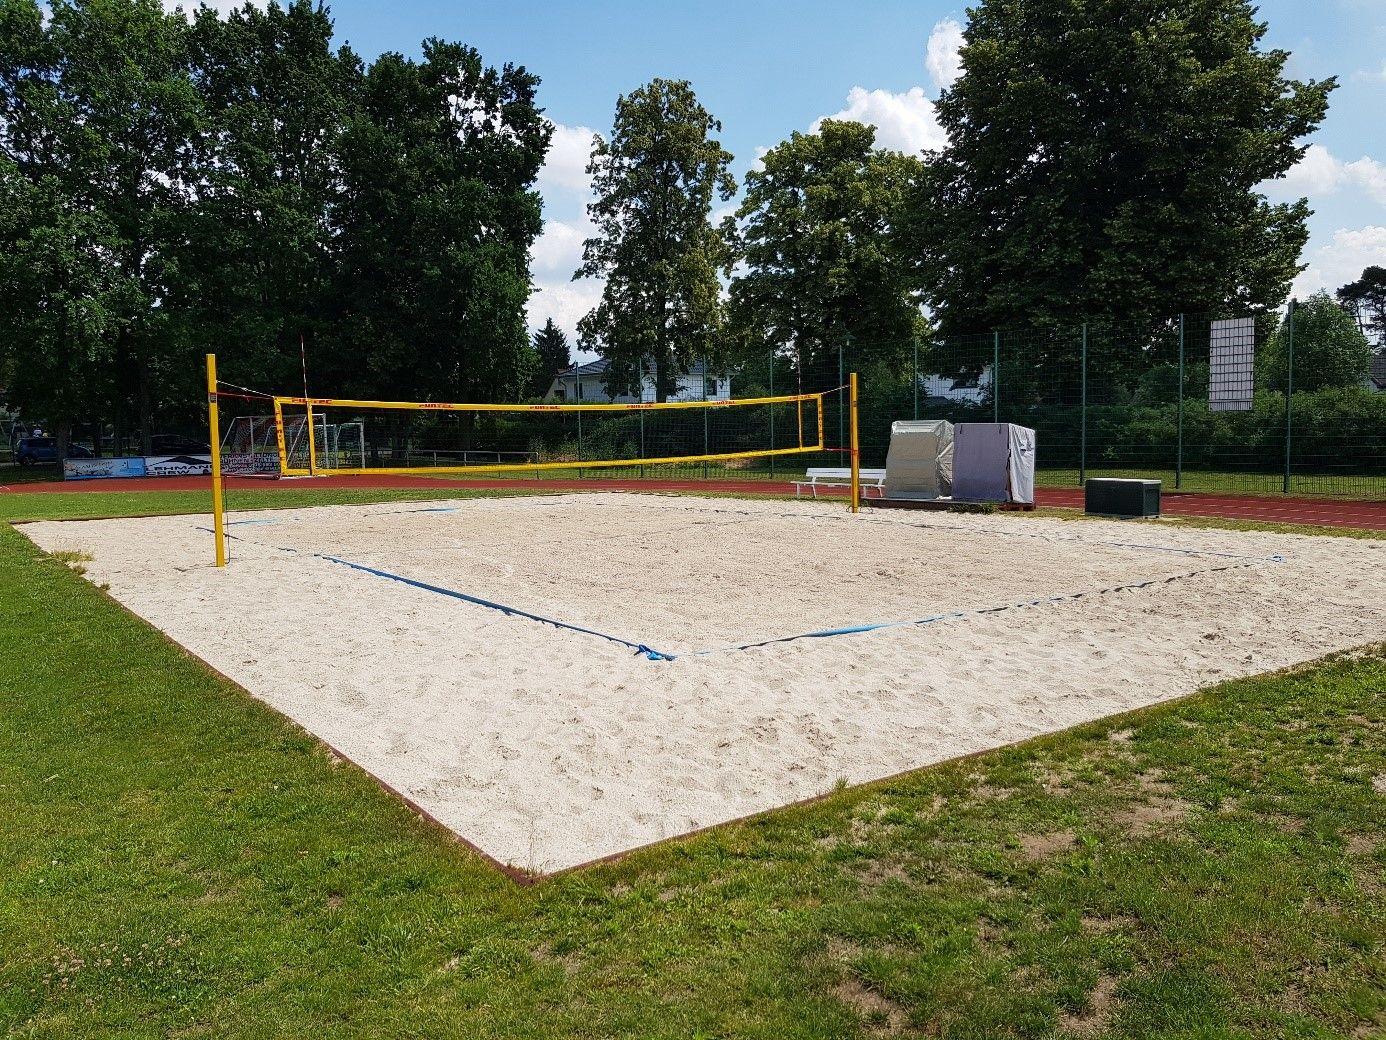 Beachvolleyballfeld | BSV Rot Weiß Schönow